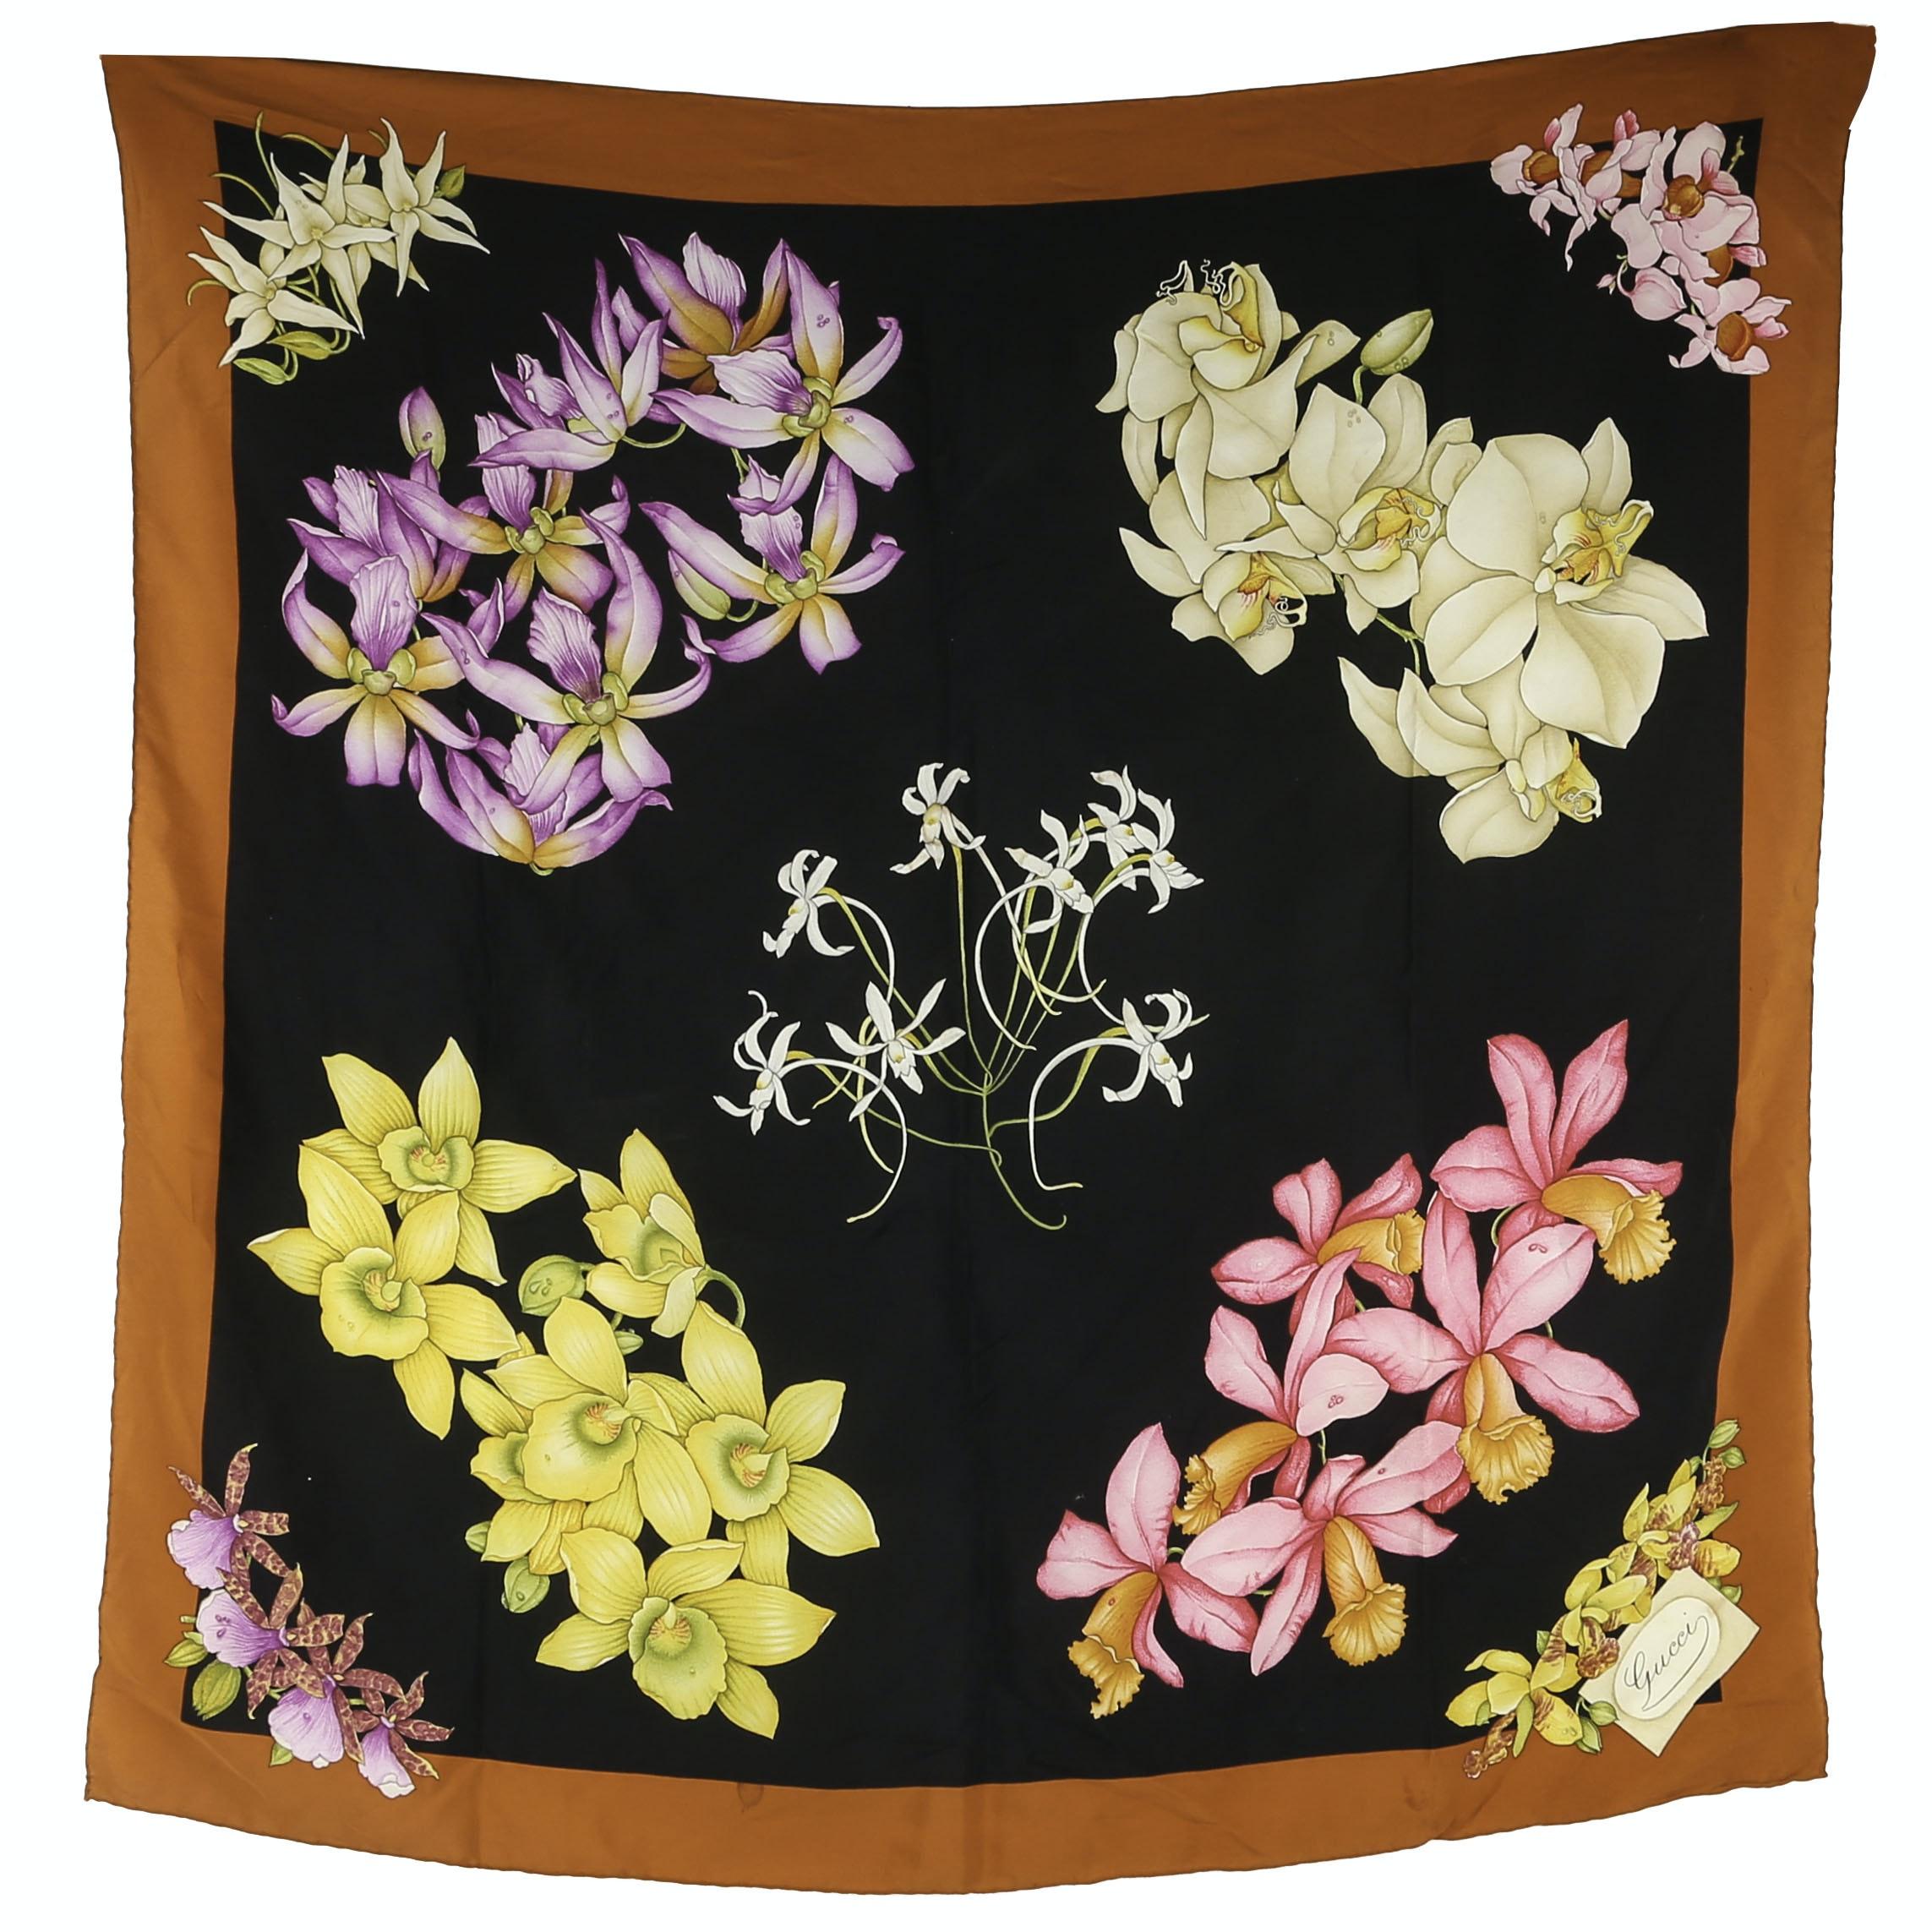 Gucci Silk Scarf in Florals